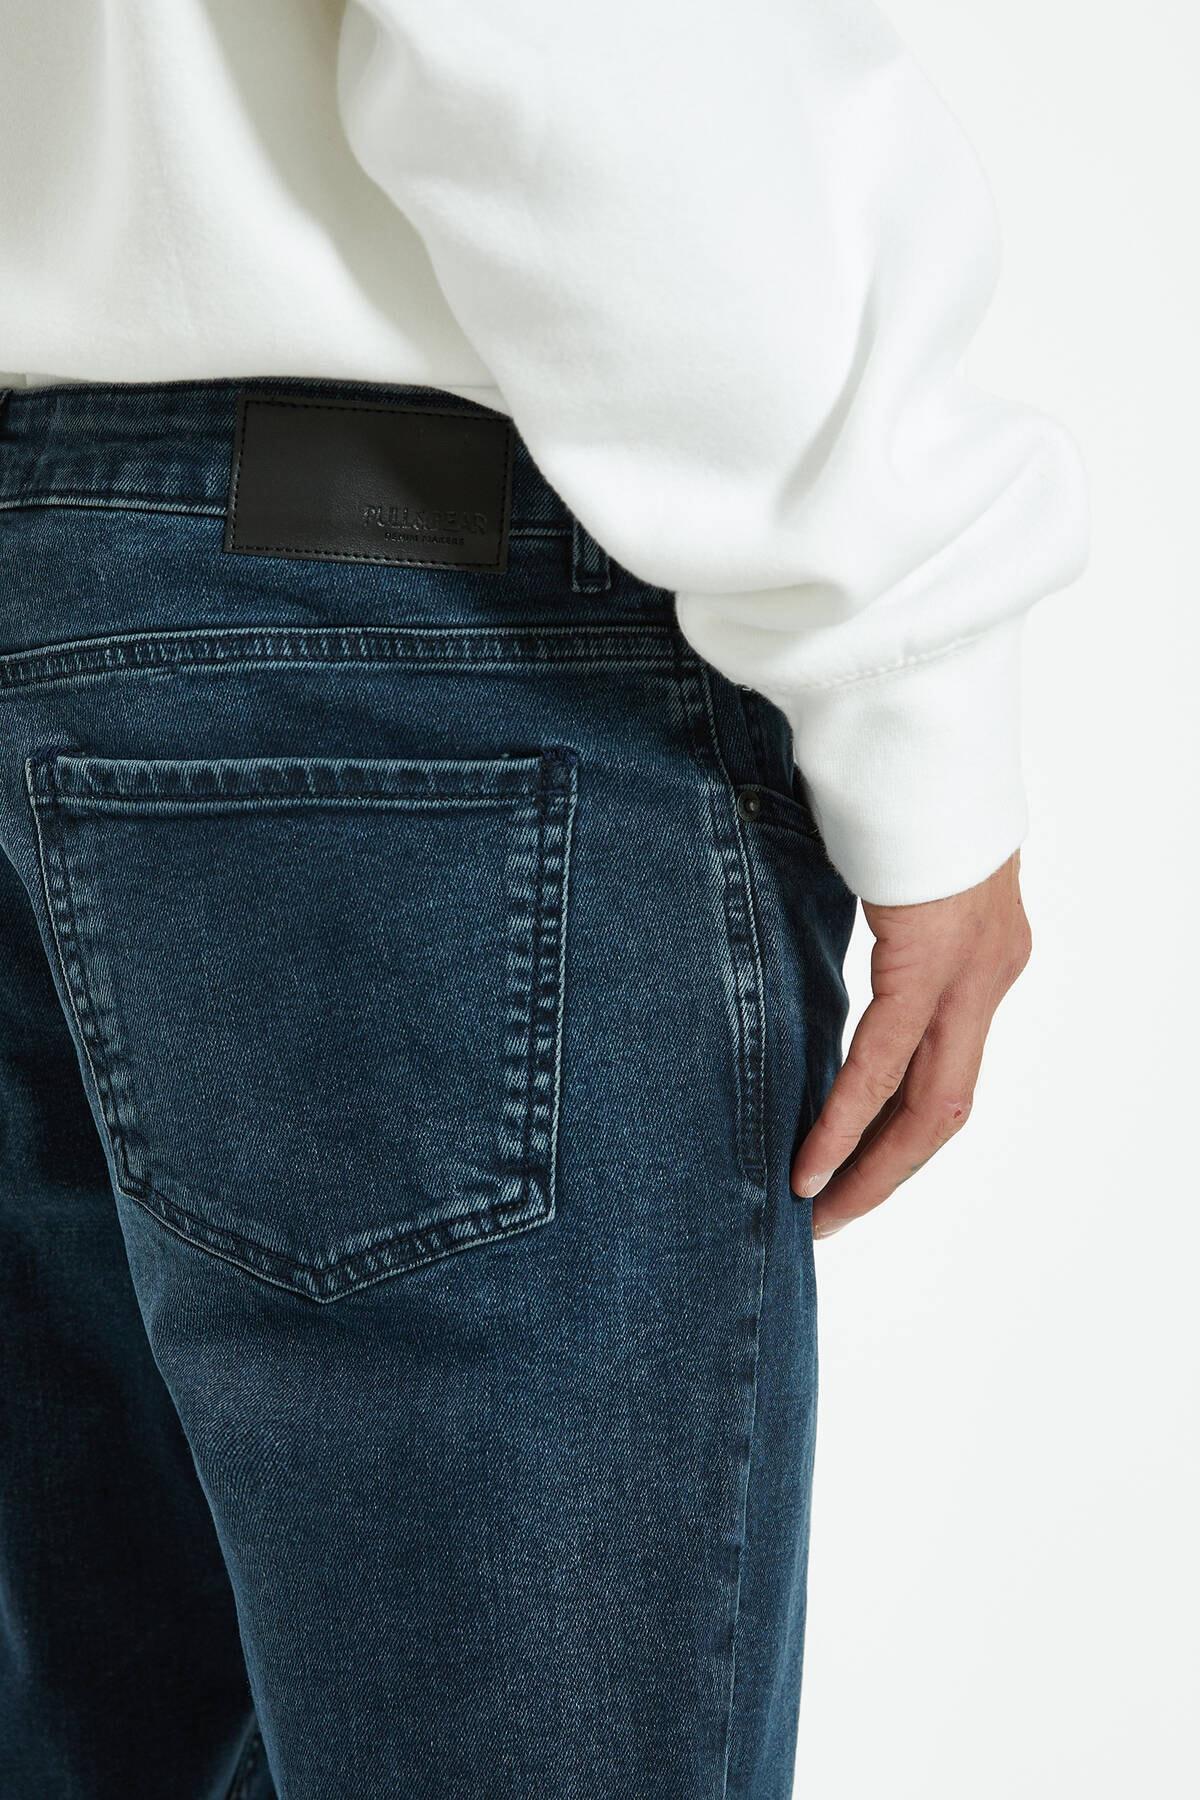 Pull & Bear Erkek Lavanta Rengi Distressed Detaylı Comfort Slim Fit Jean 09683533 1